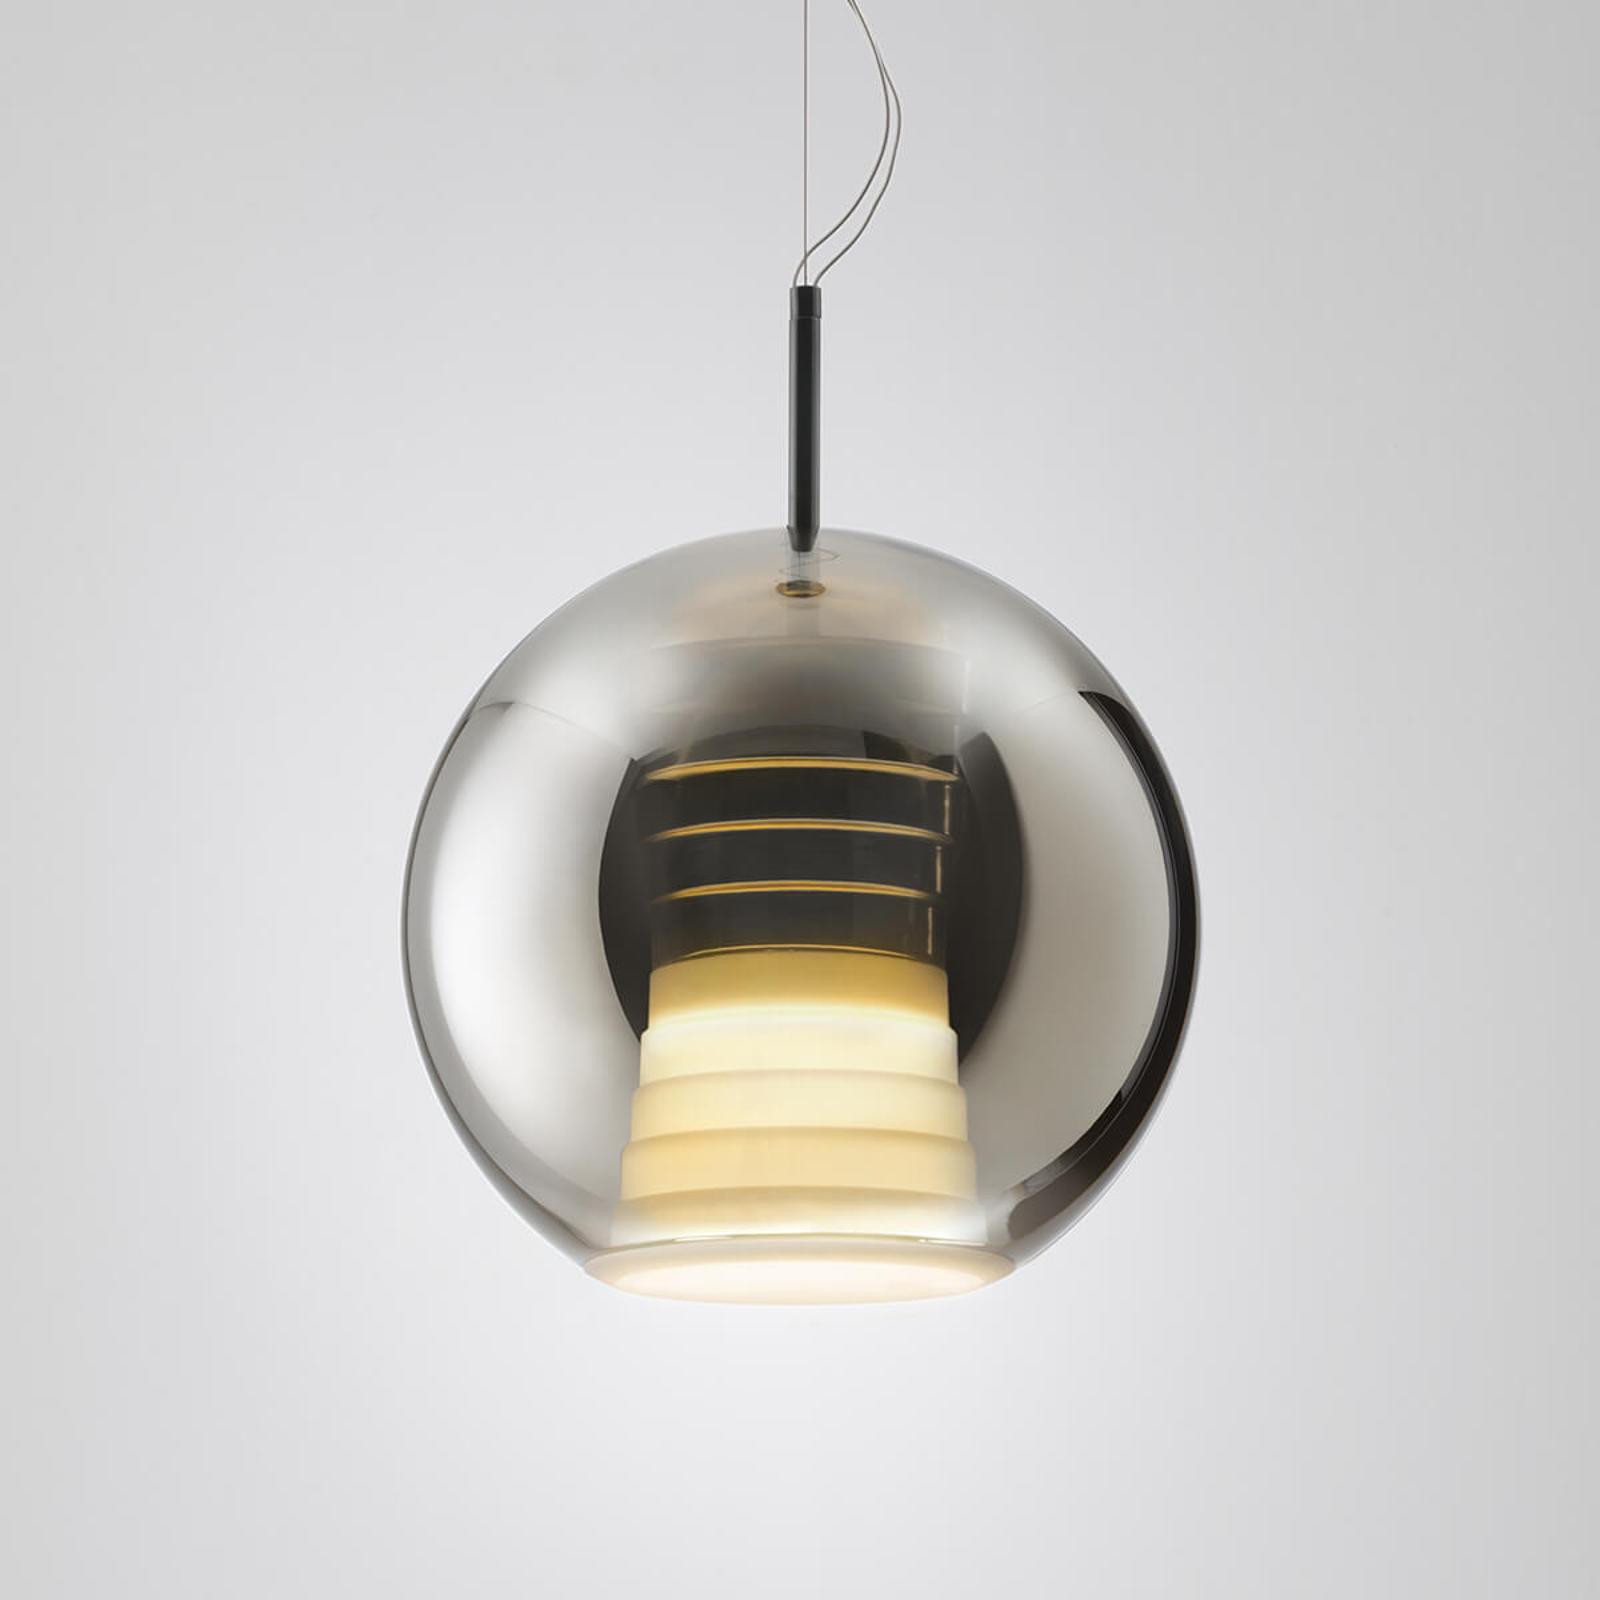 Fabbian Beluga Royal -LED-riippuvalo titan 30 cm